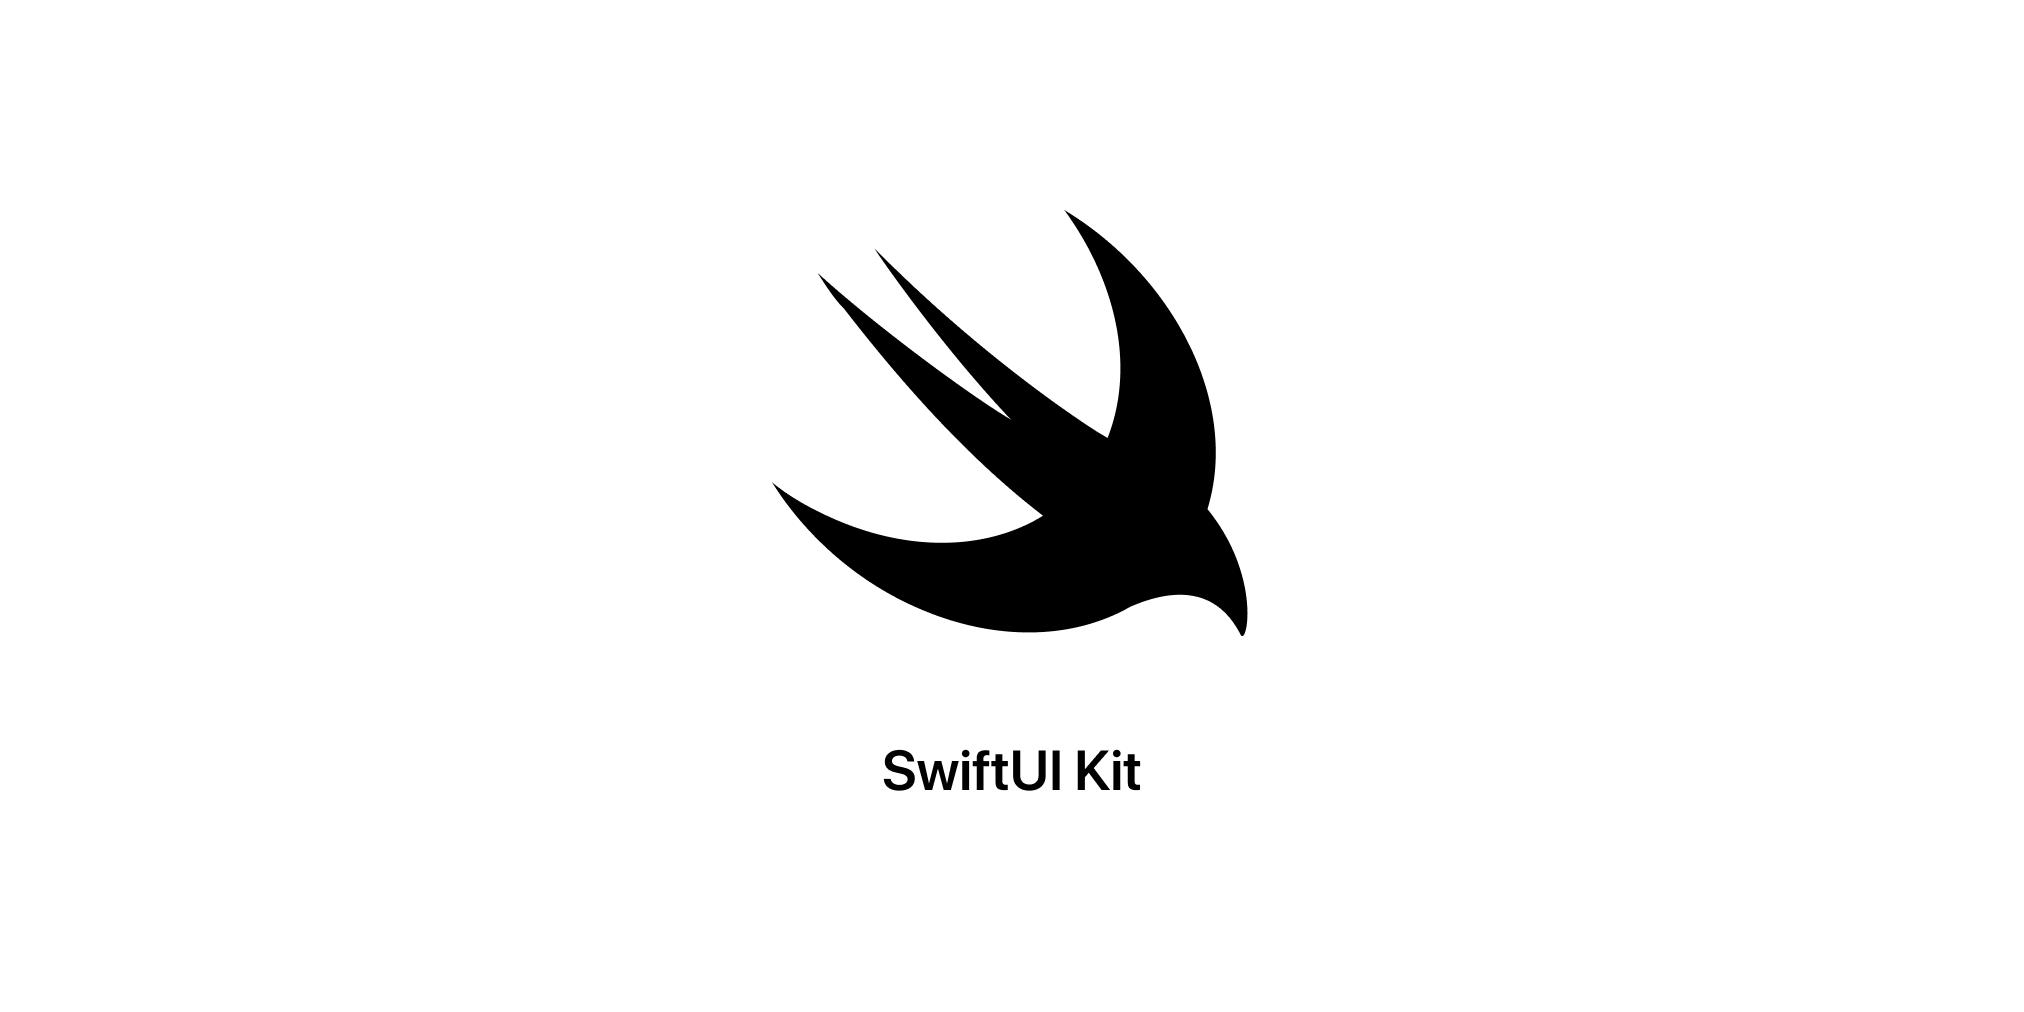 SwiftUI Kit